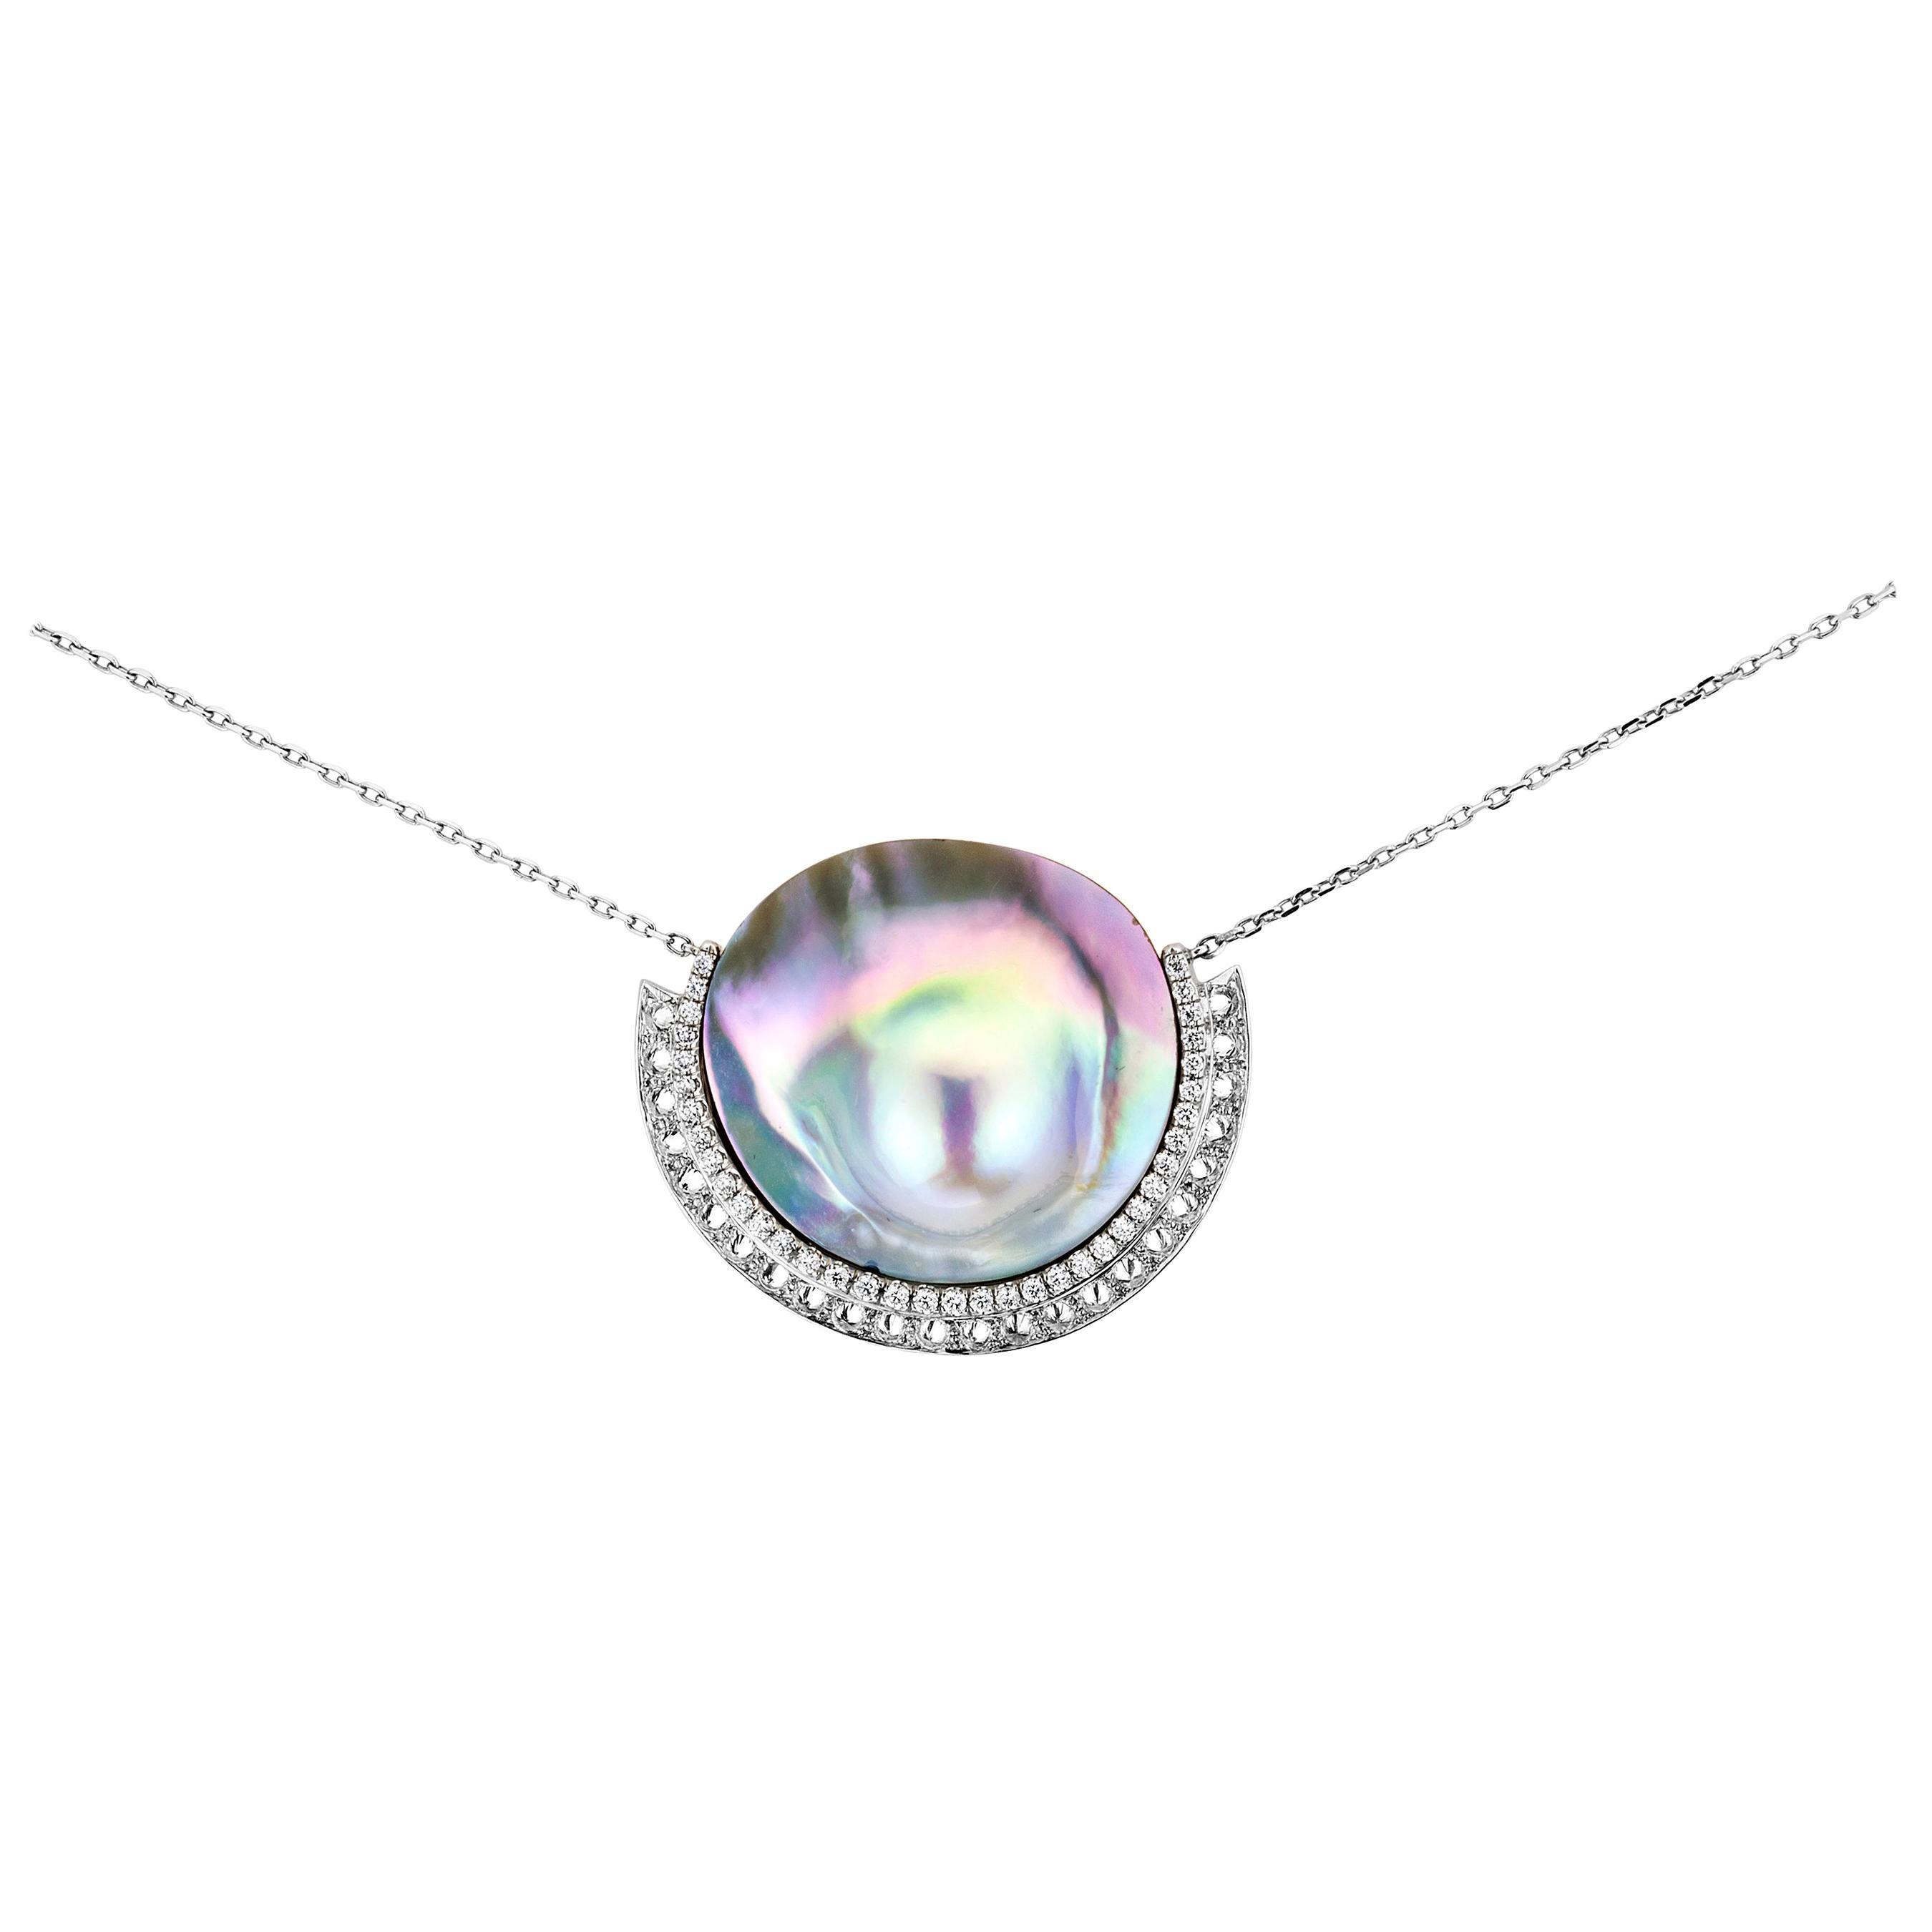 AnaKatarina Sea of Cortez Peacock Pearl and Diamond White Gold Necklace